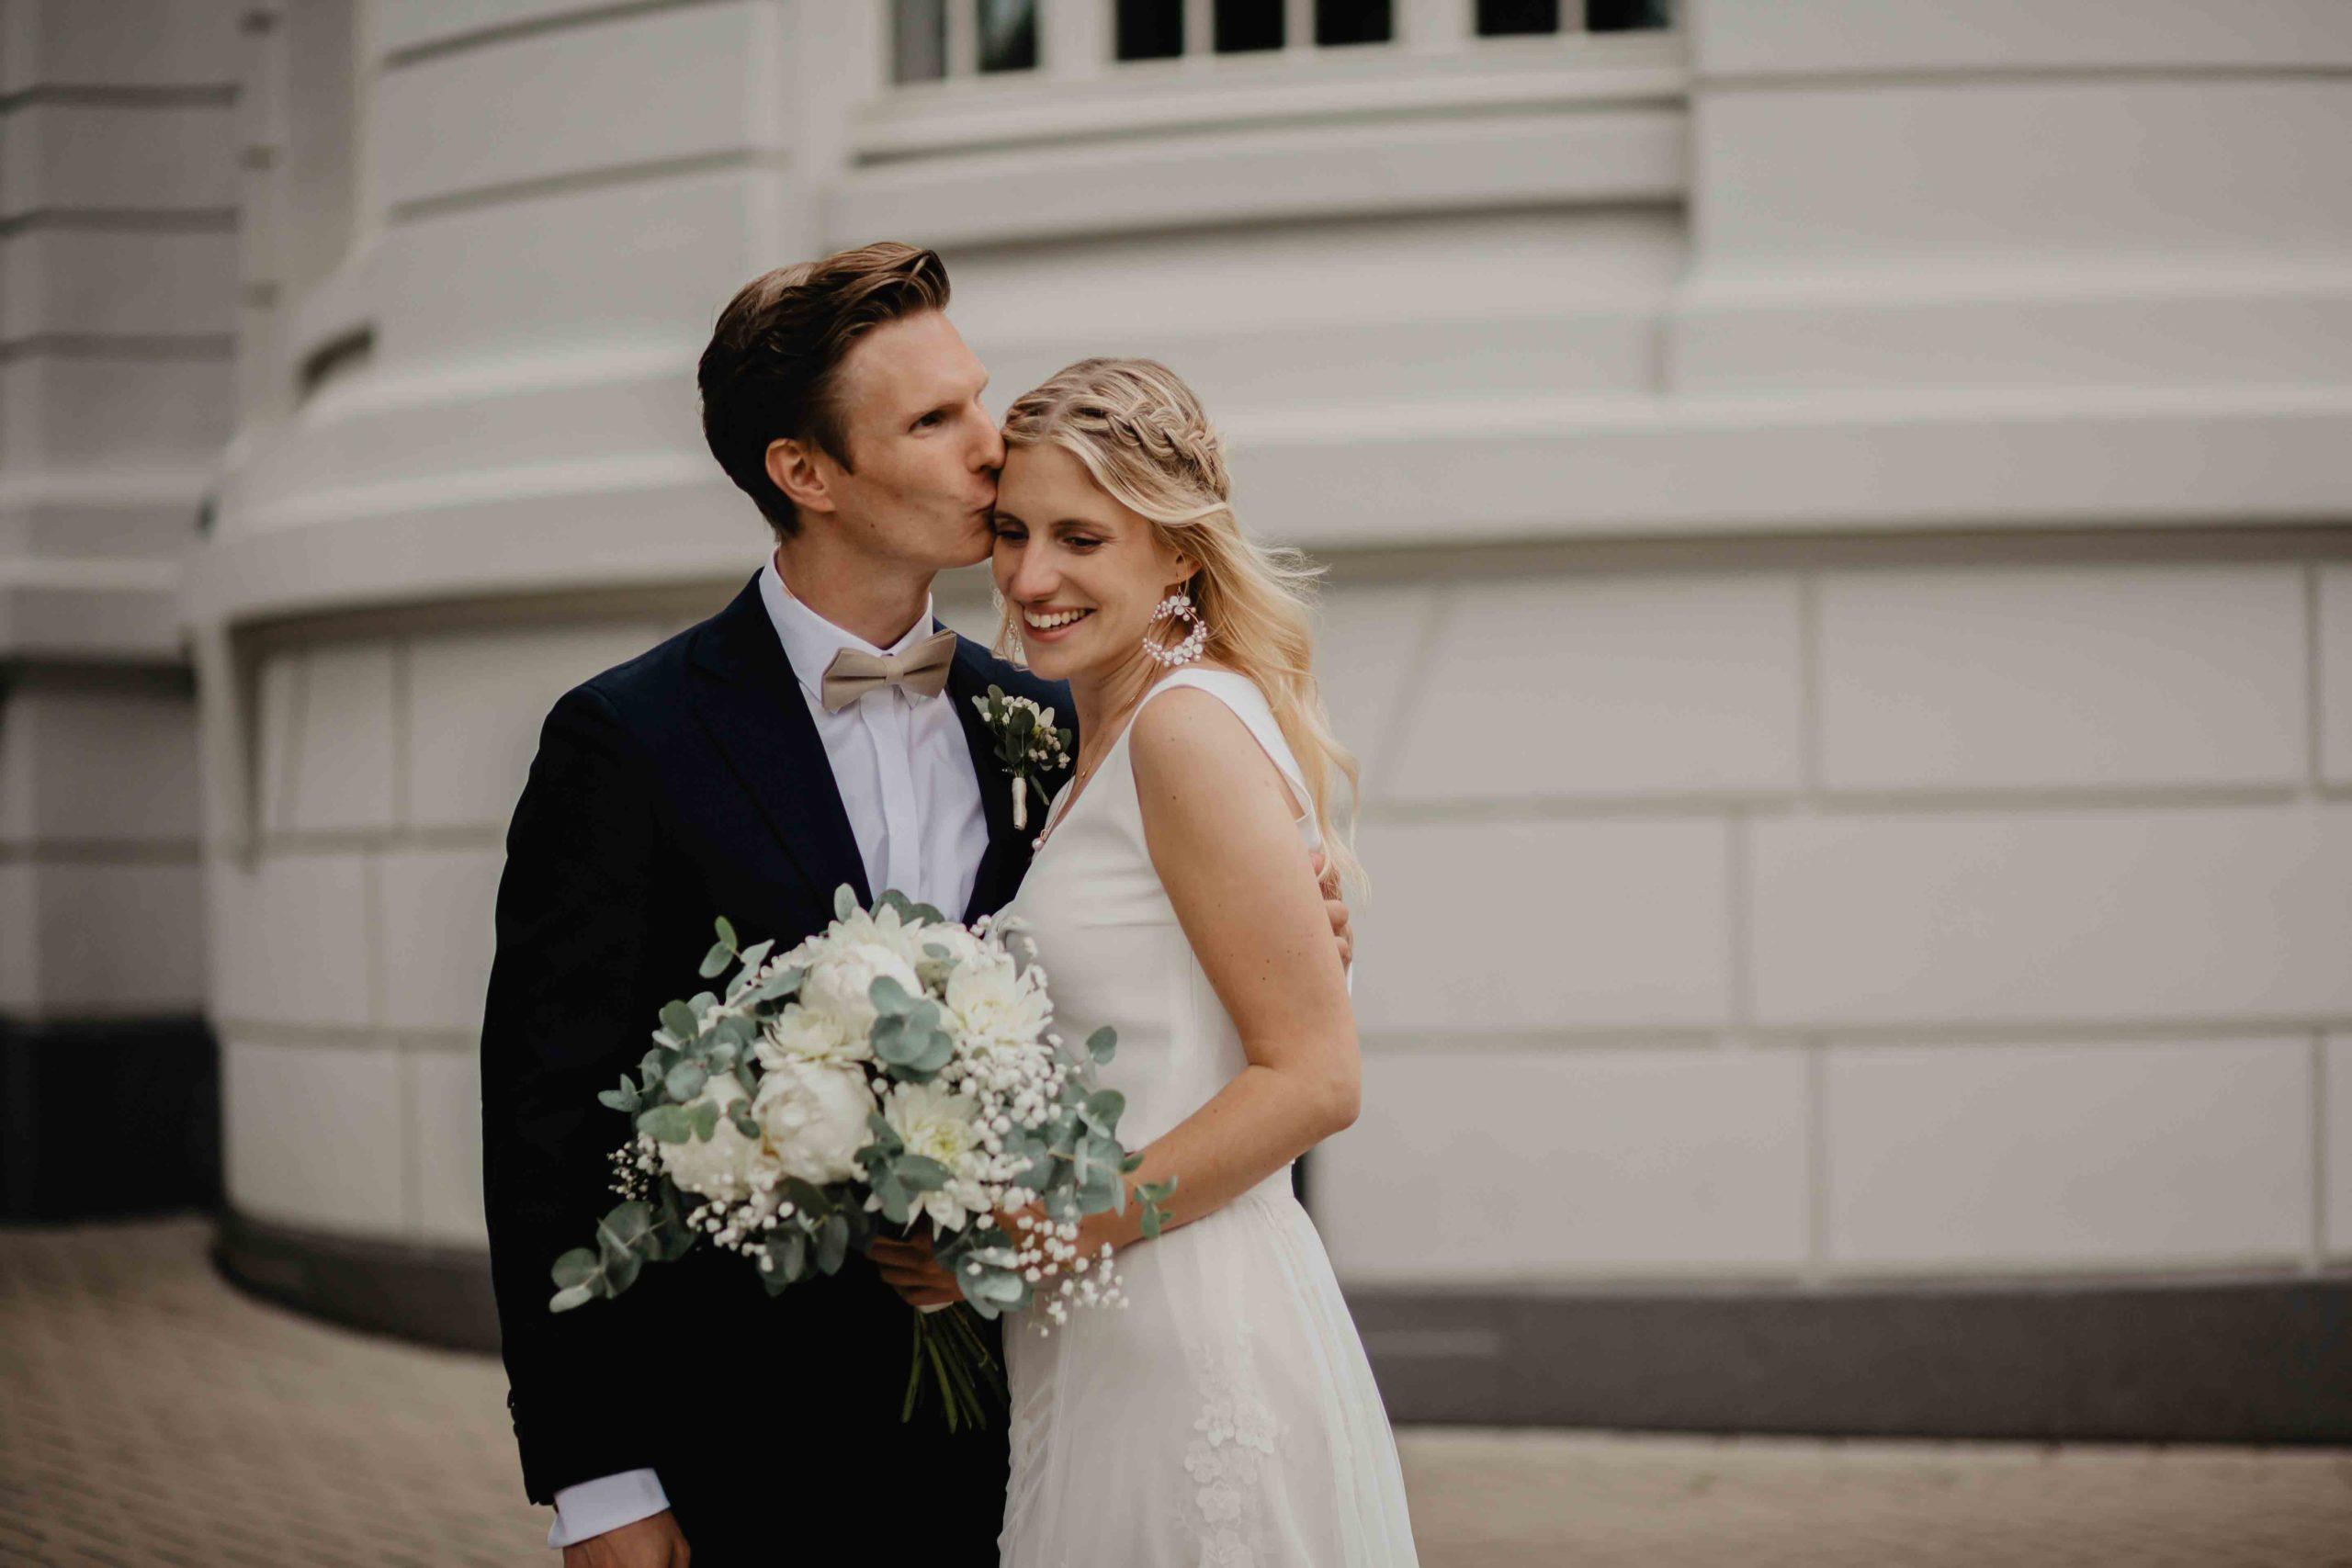 Bräutigam küsst Braut auf Wange